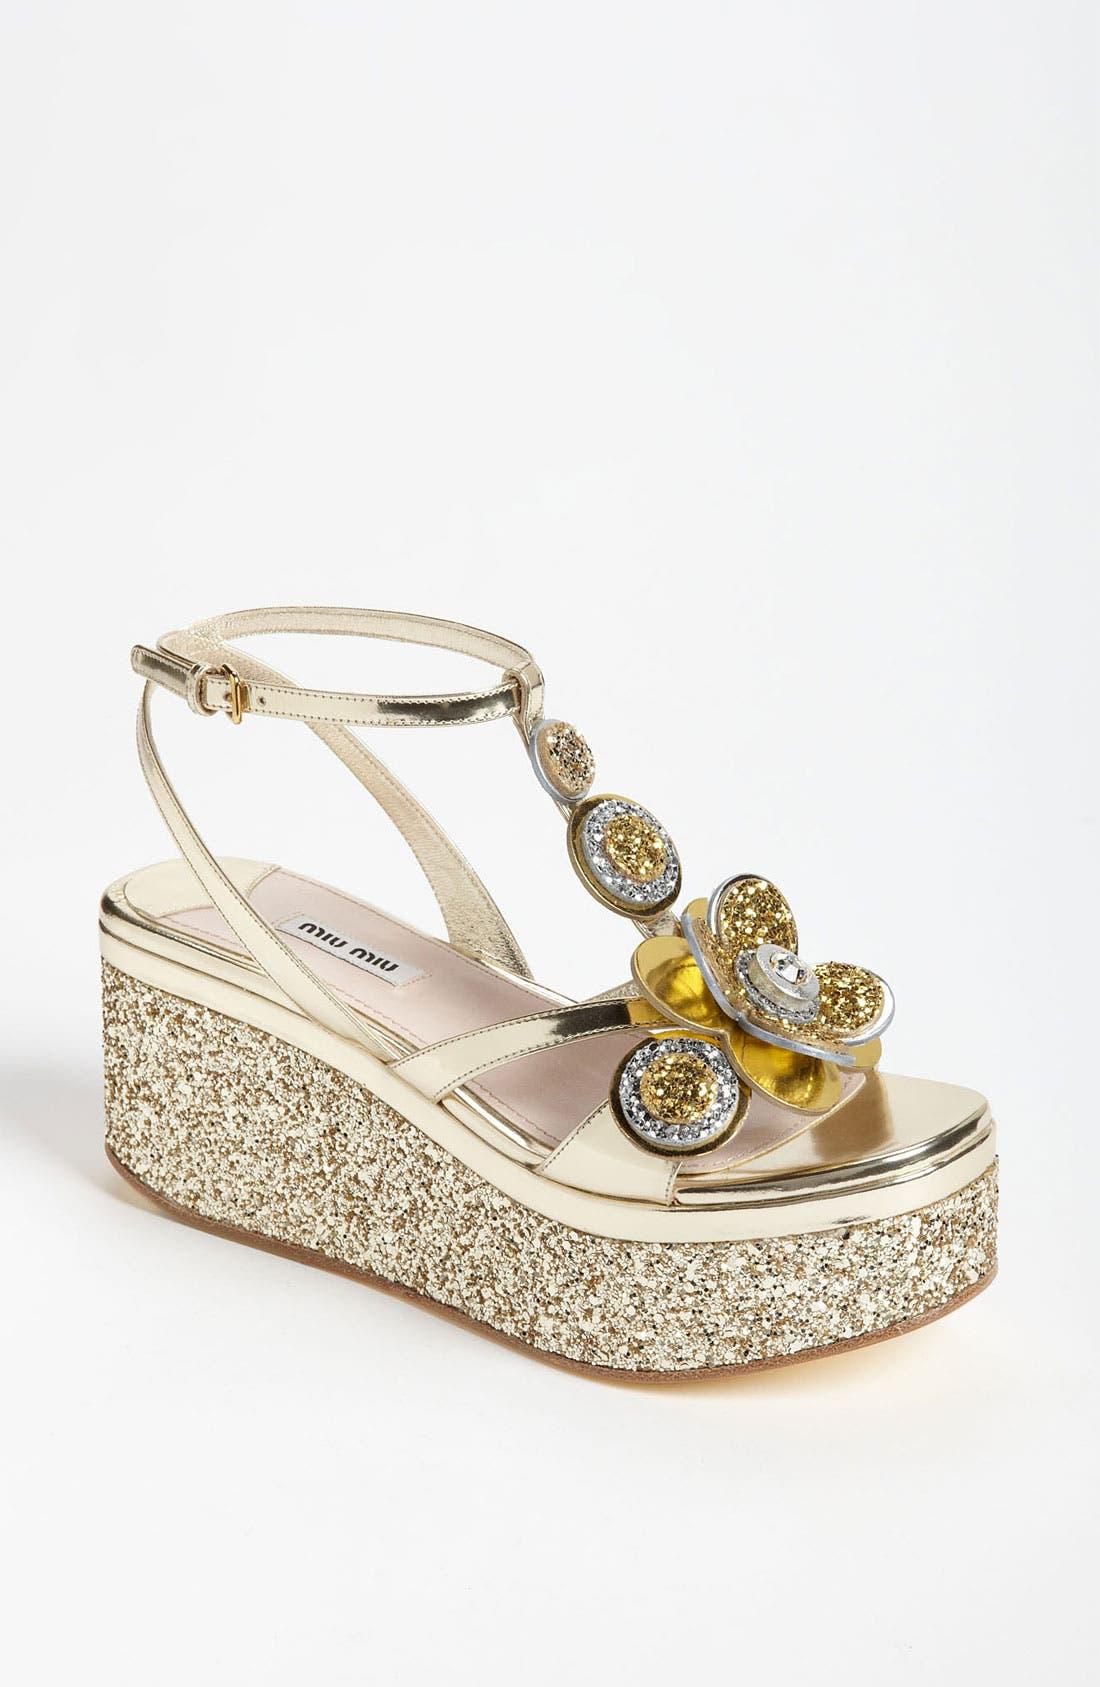 Alternate Image 1 Selected - Miu Miu Flower Platform Sandal